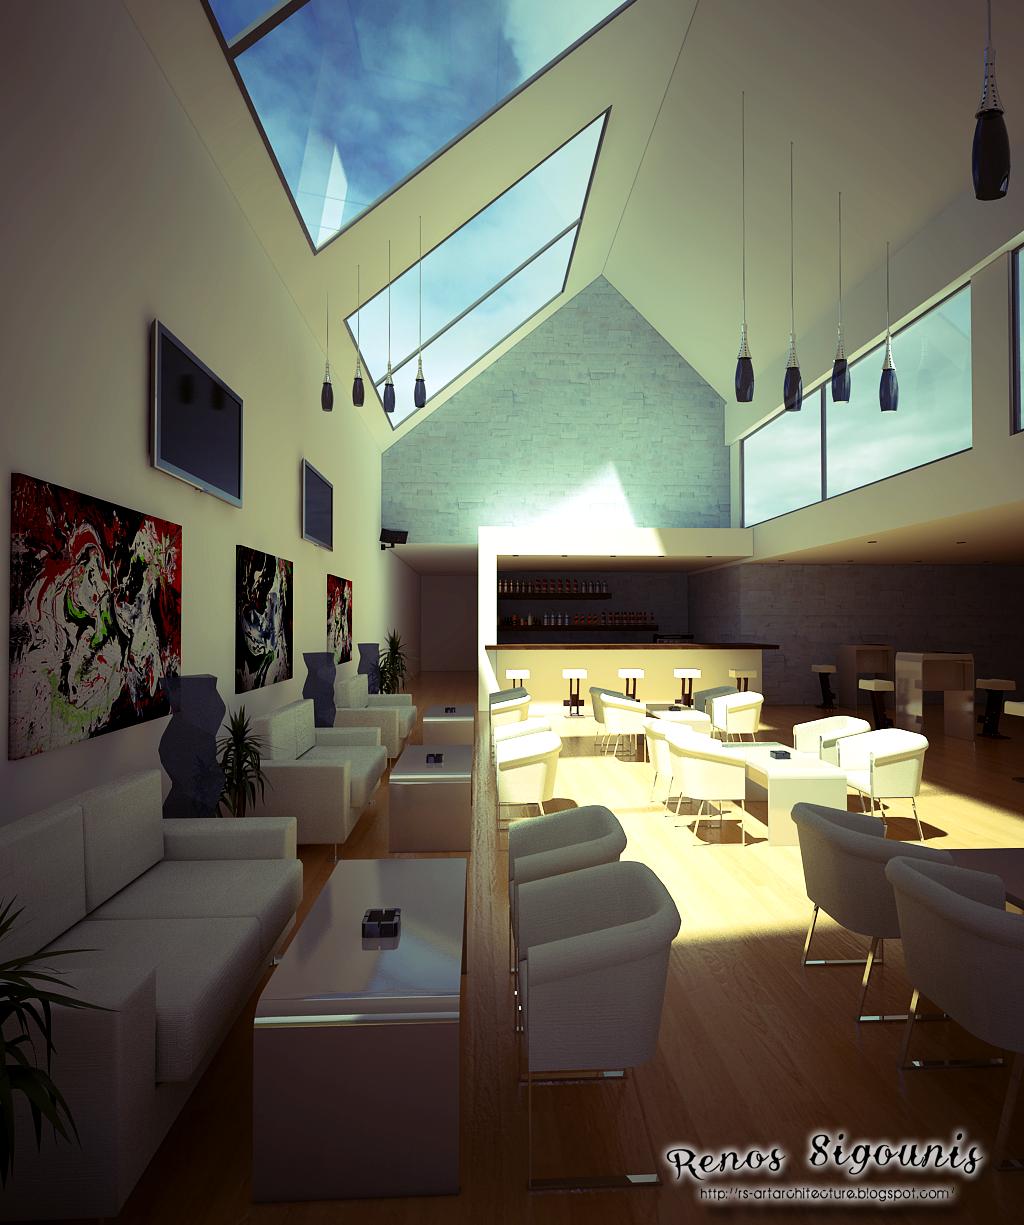 Renos Sigounis Gallery Lomo+%28No+Vignette%291rs